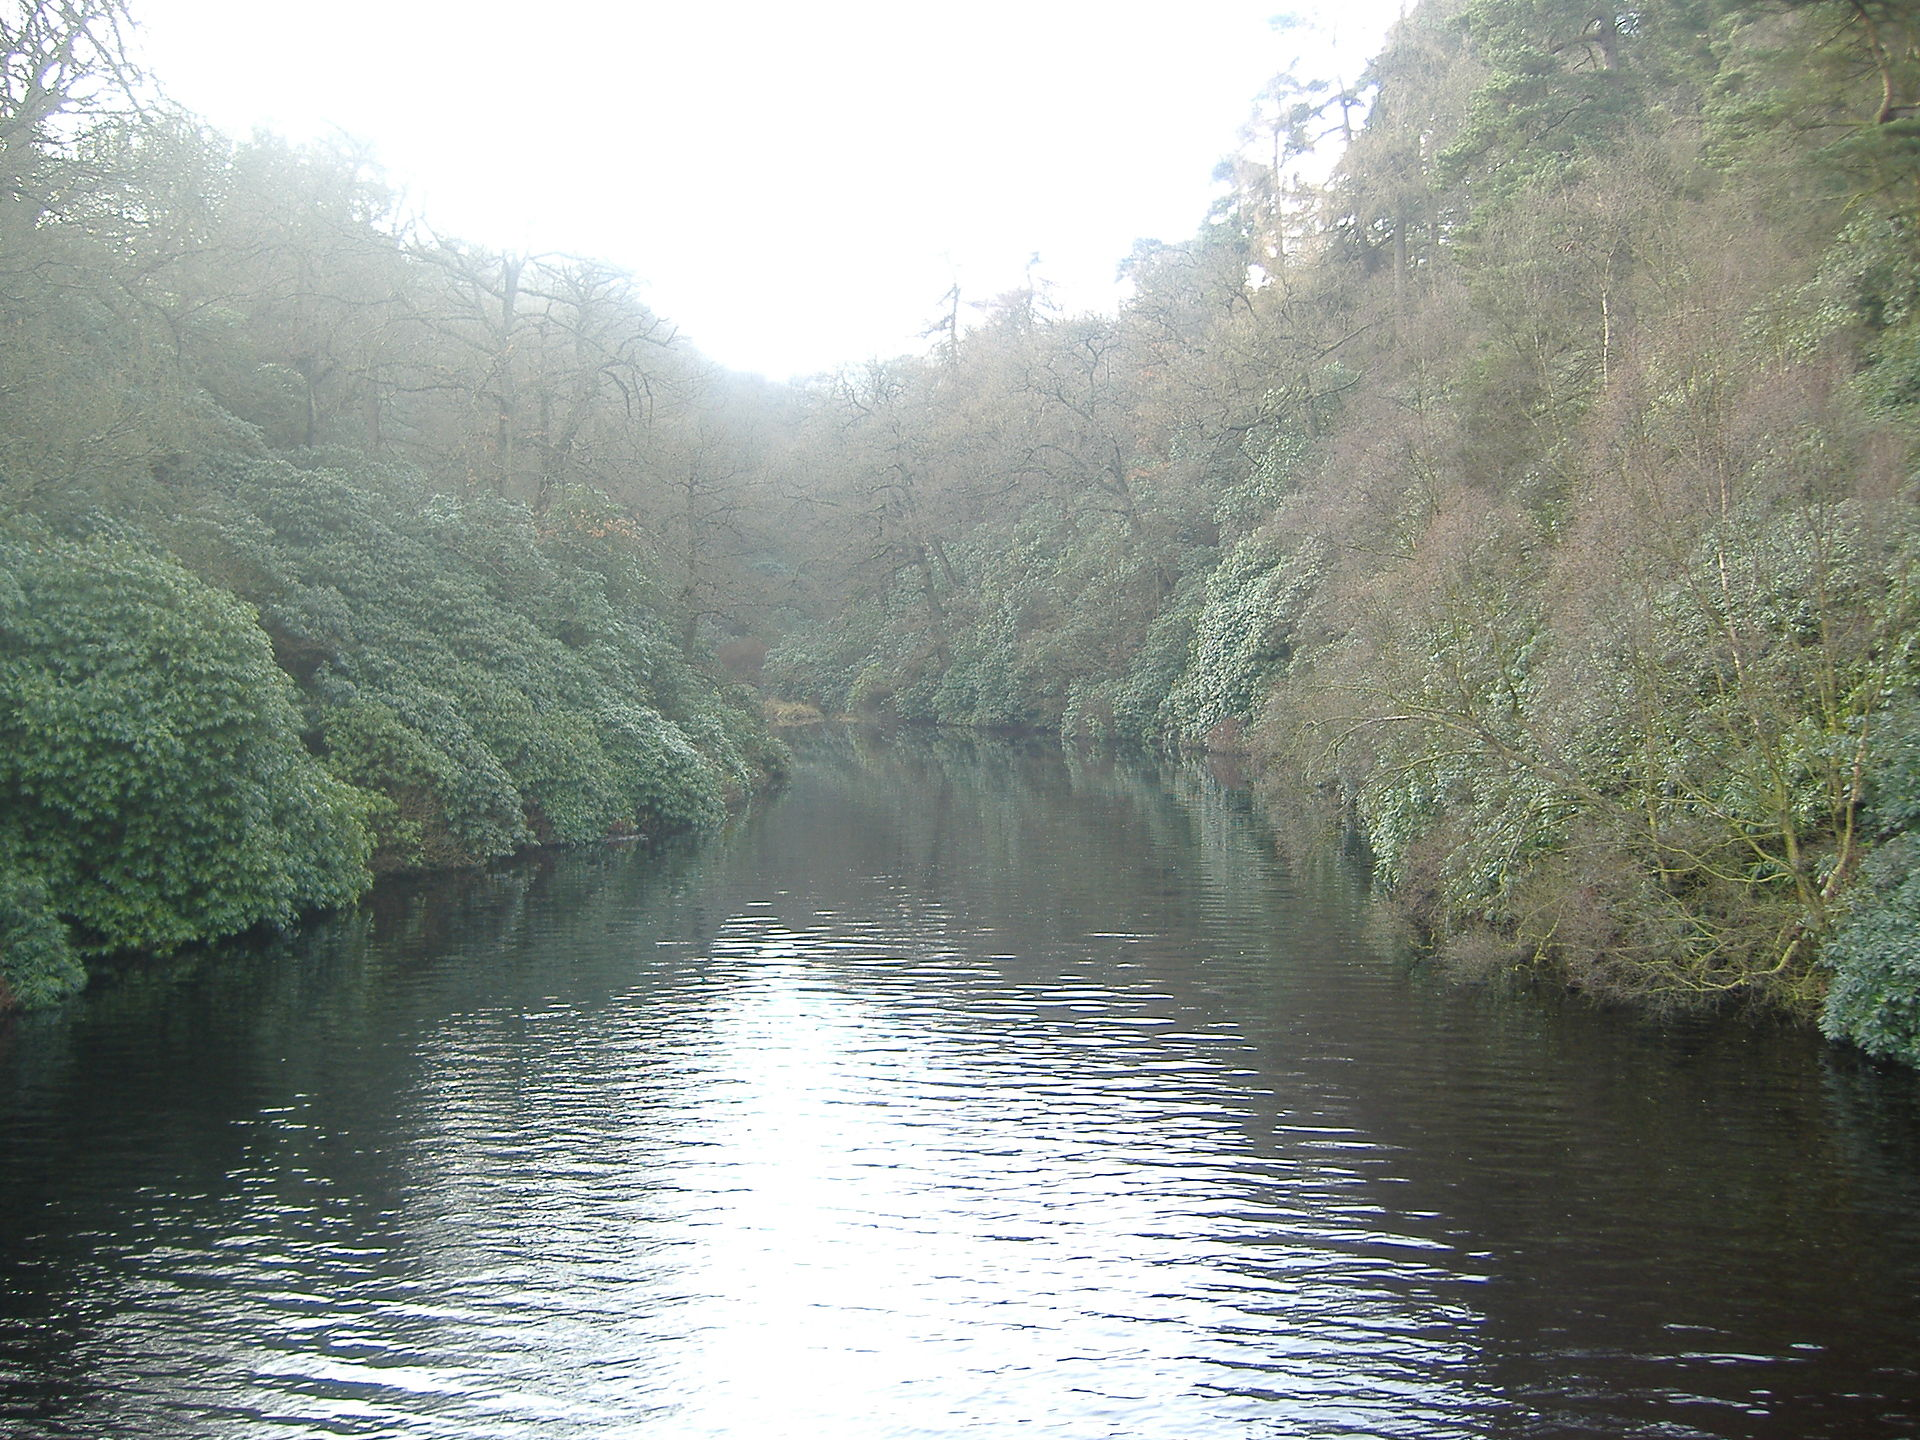 River: River Goyt